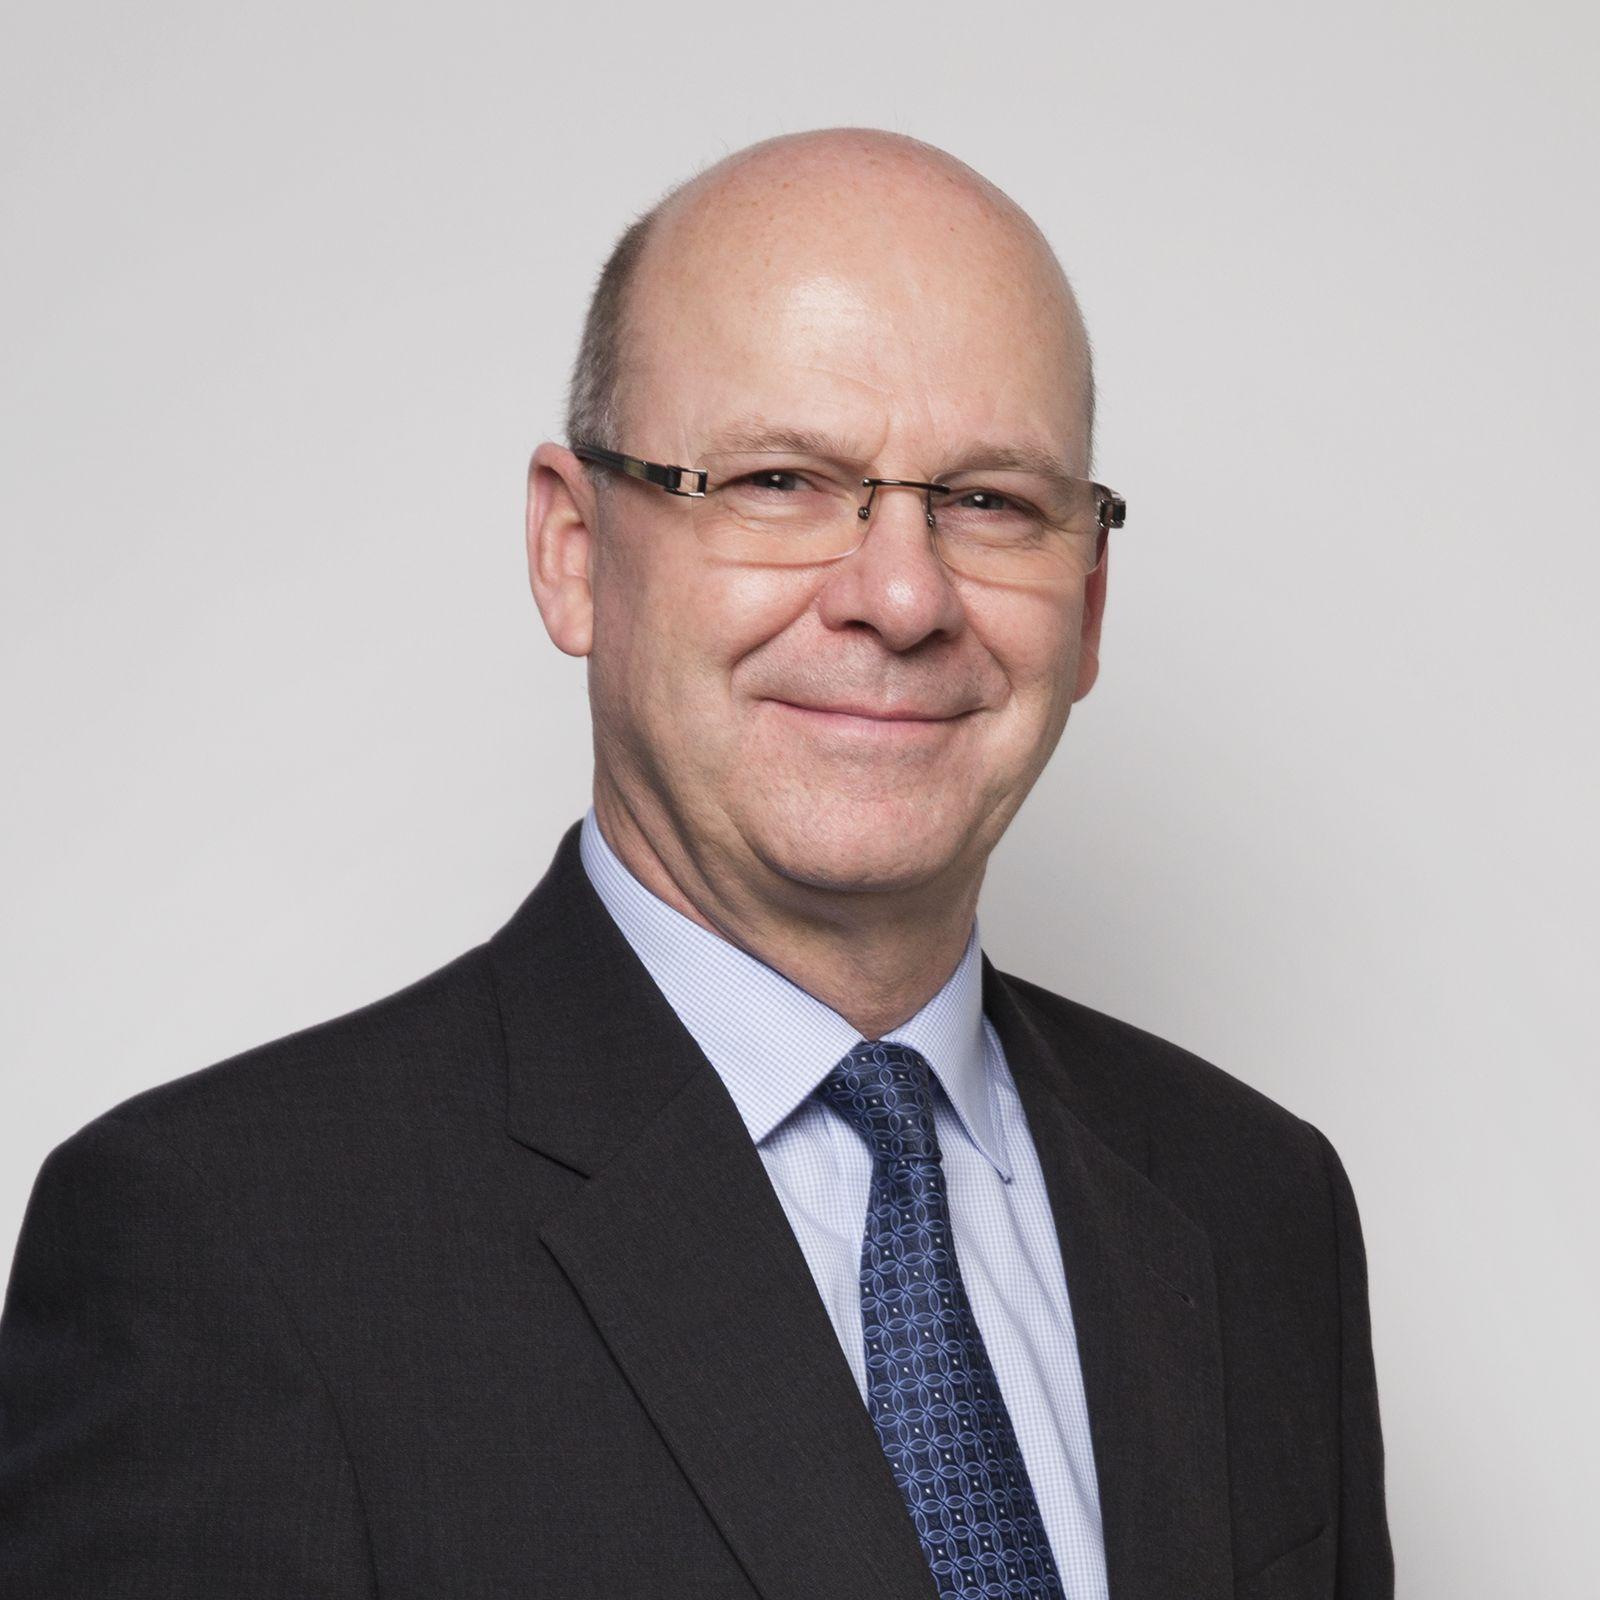 Marc-André Bacuzzi